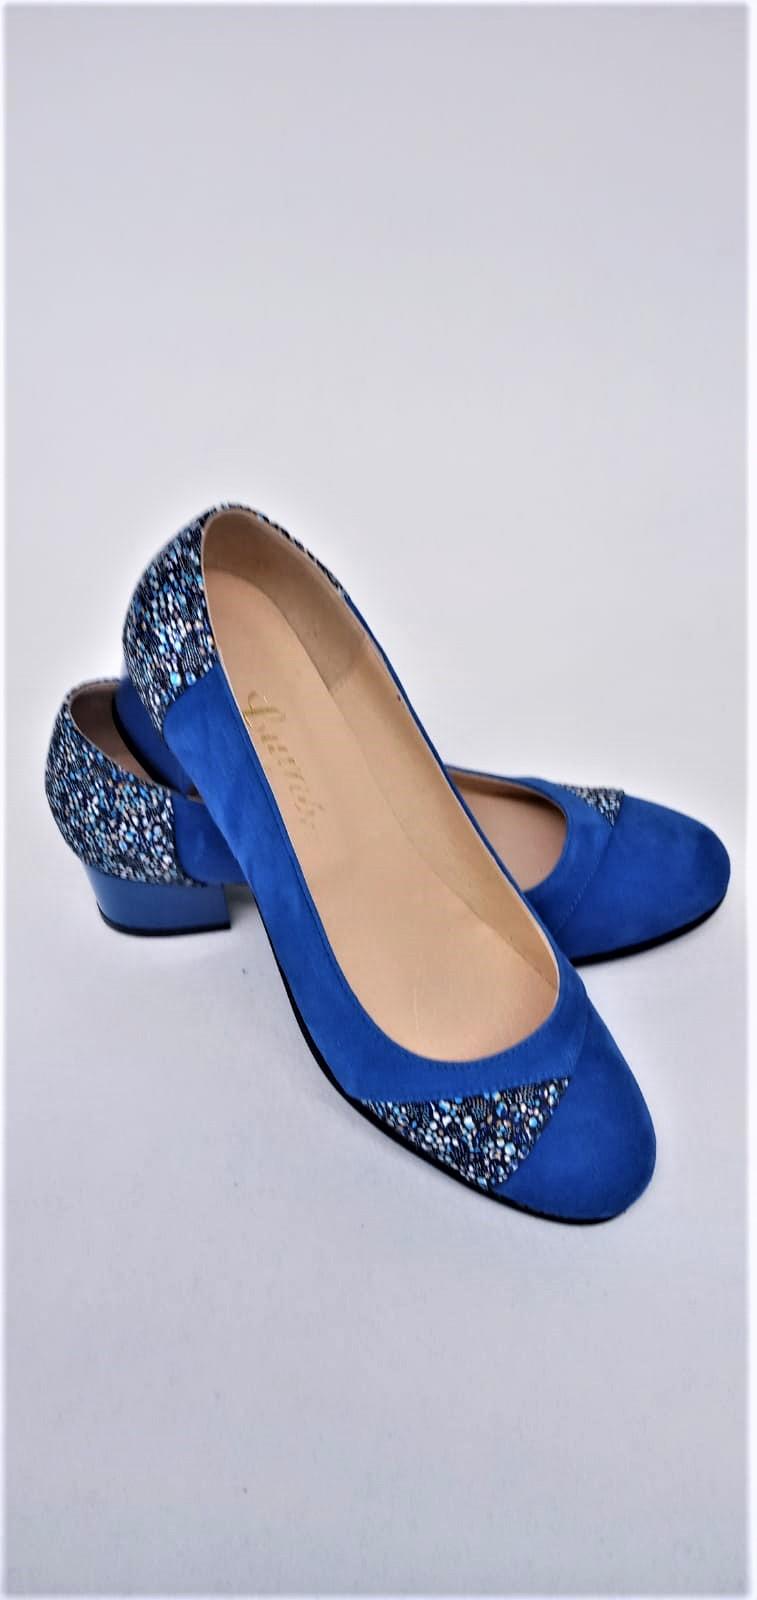 Balerini albastri din piele naturala